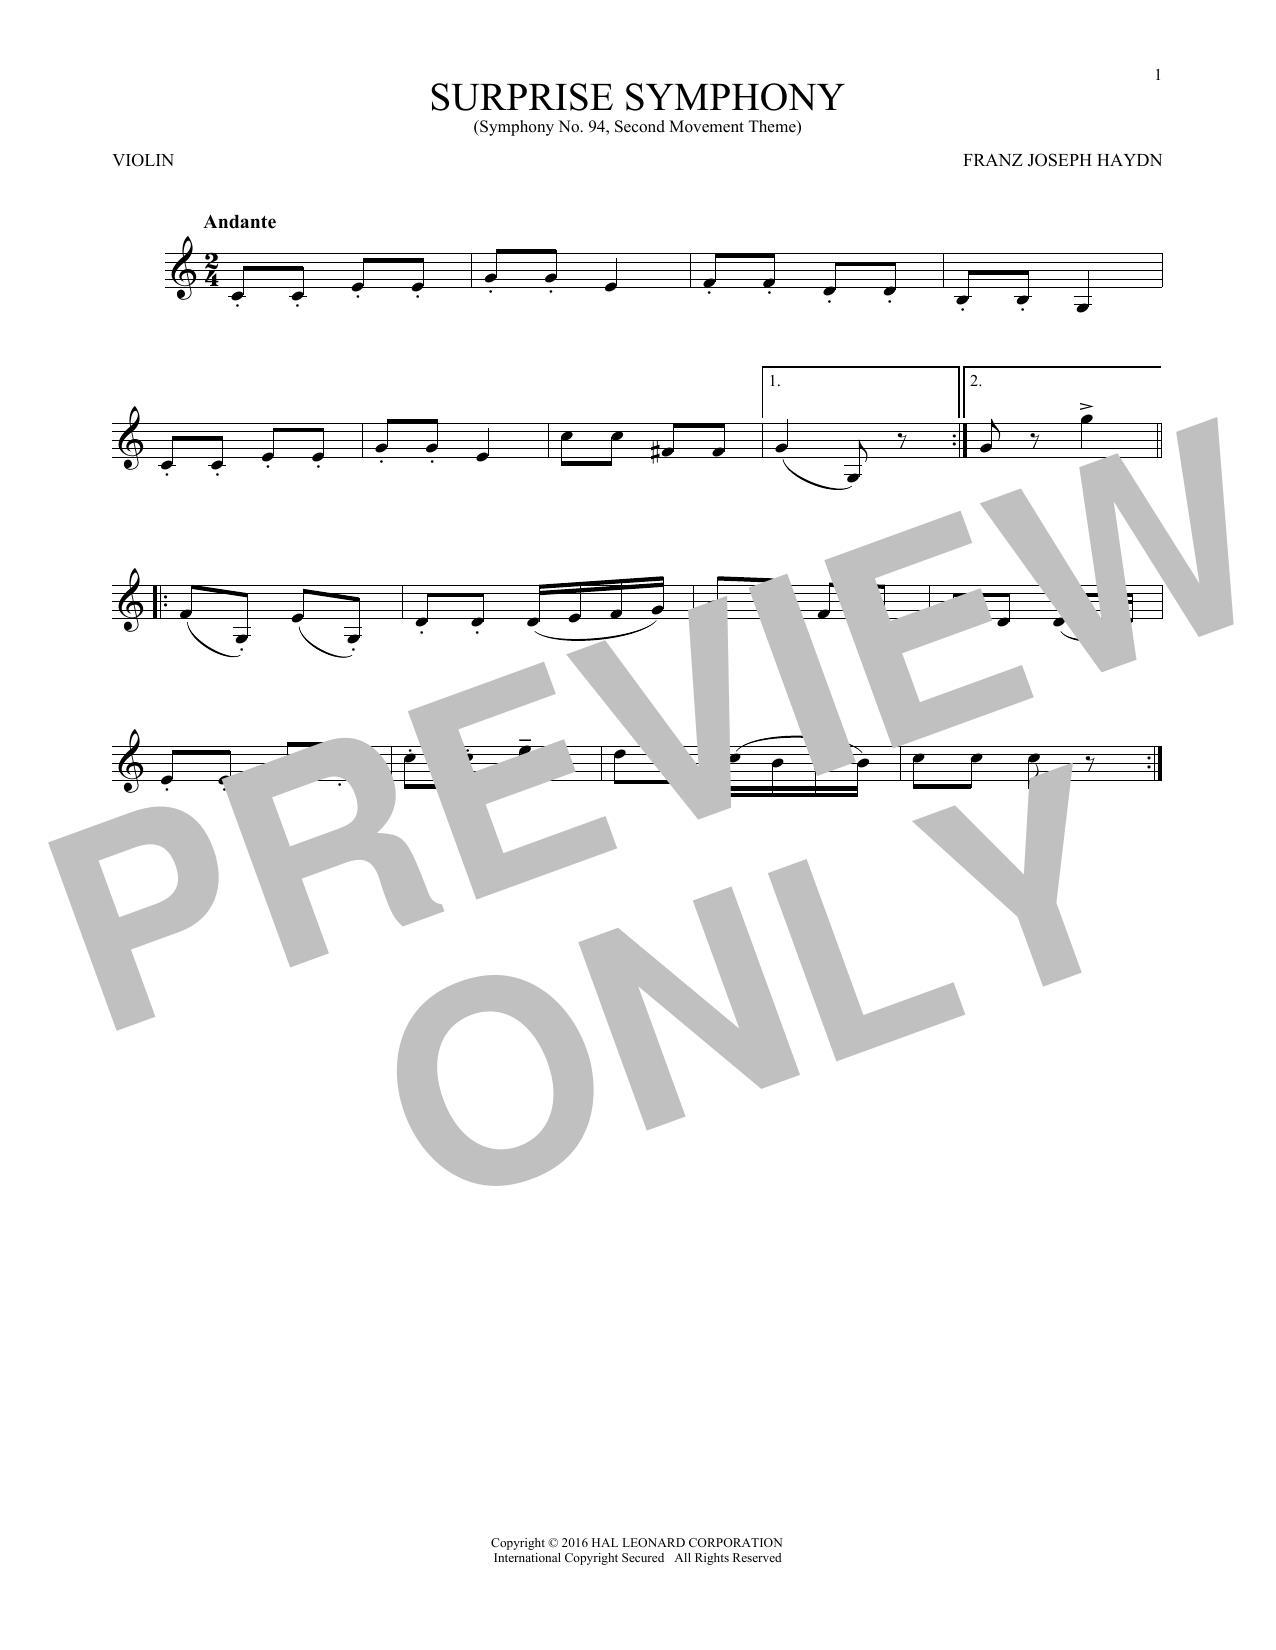 The Surprise Symphony (Violin Solo)